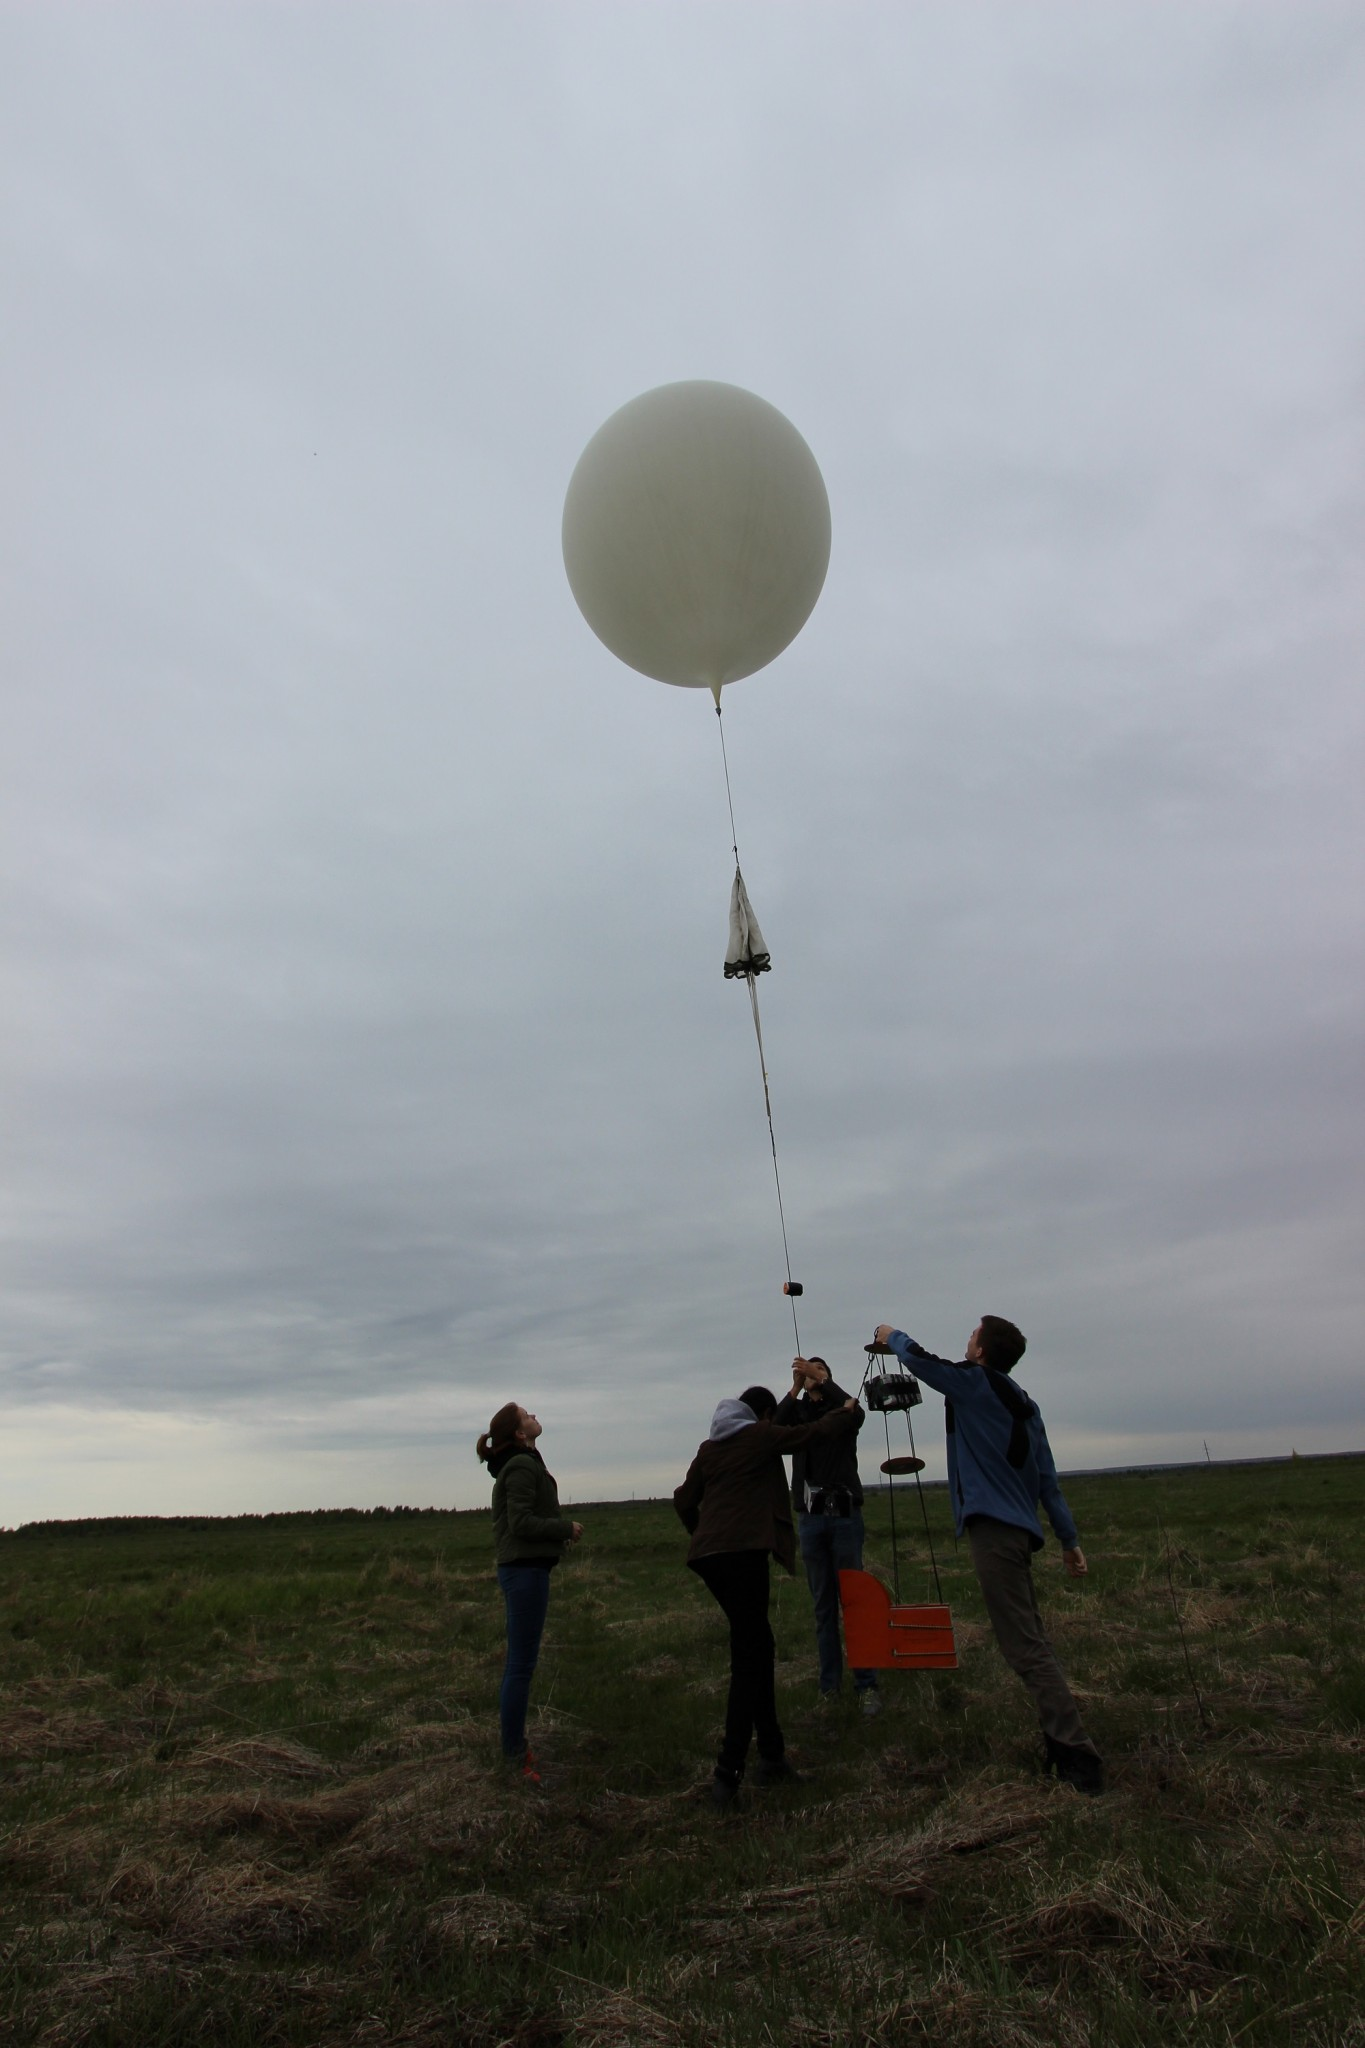 Ksenia Smirnova, Shreya Santra, Miguel Cabrera and Ilya Yuskevich release their balloon. Photo: Skoltech.